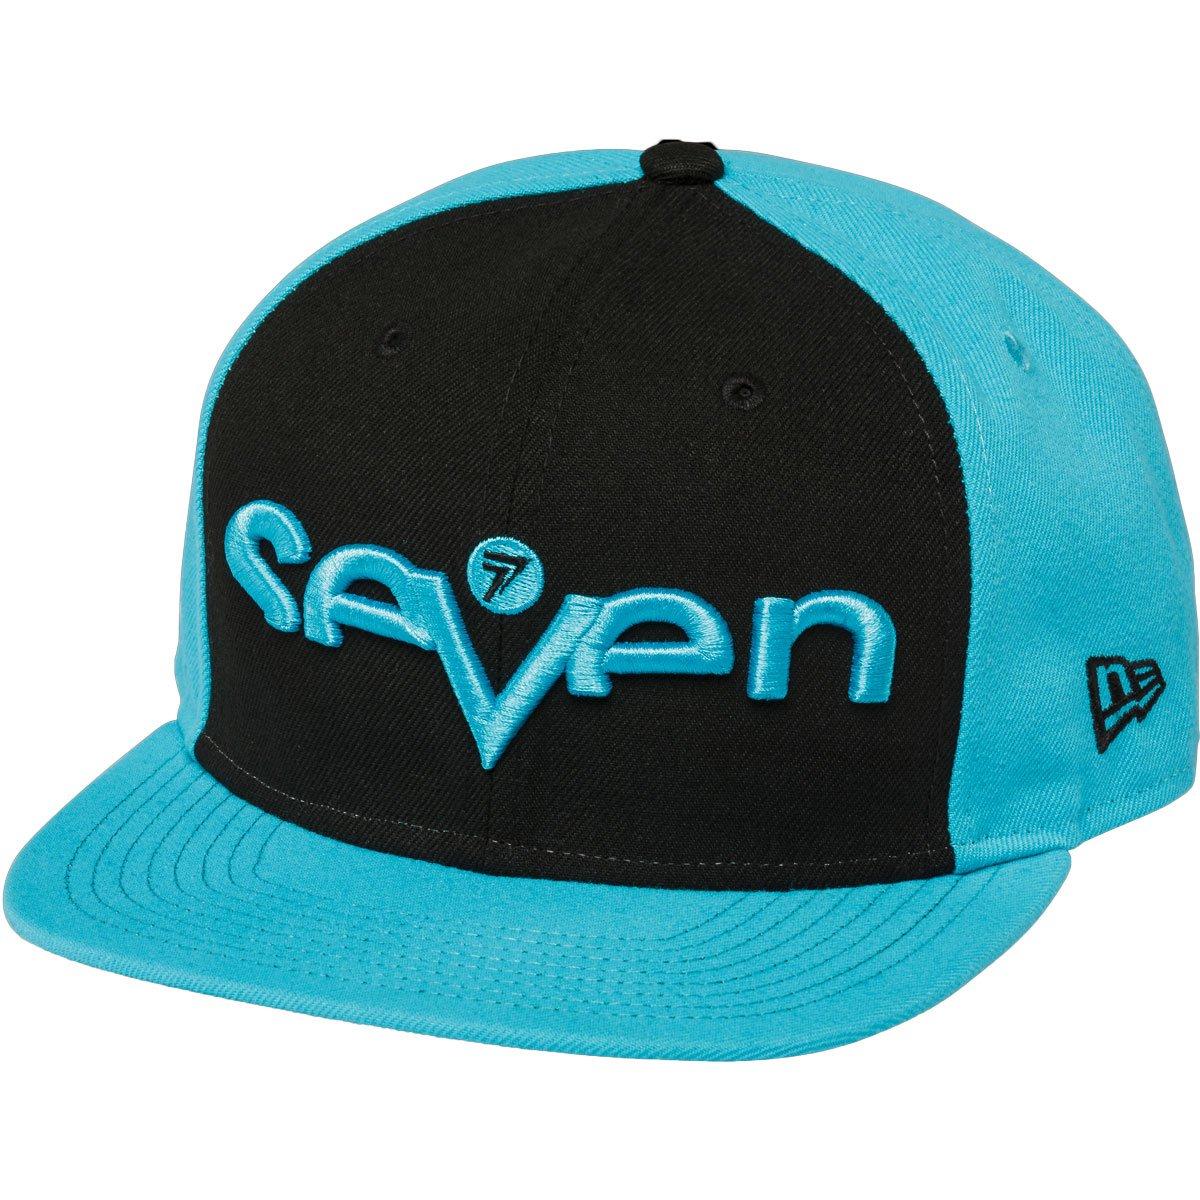 Seven Youth Brand Snapback Hat-Black/Light Blue